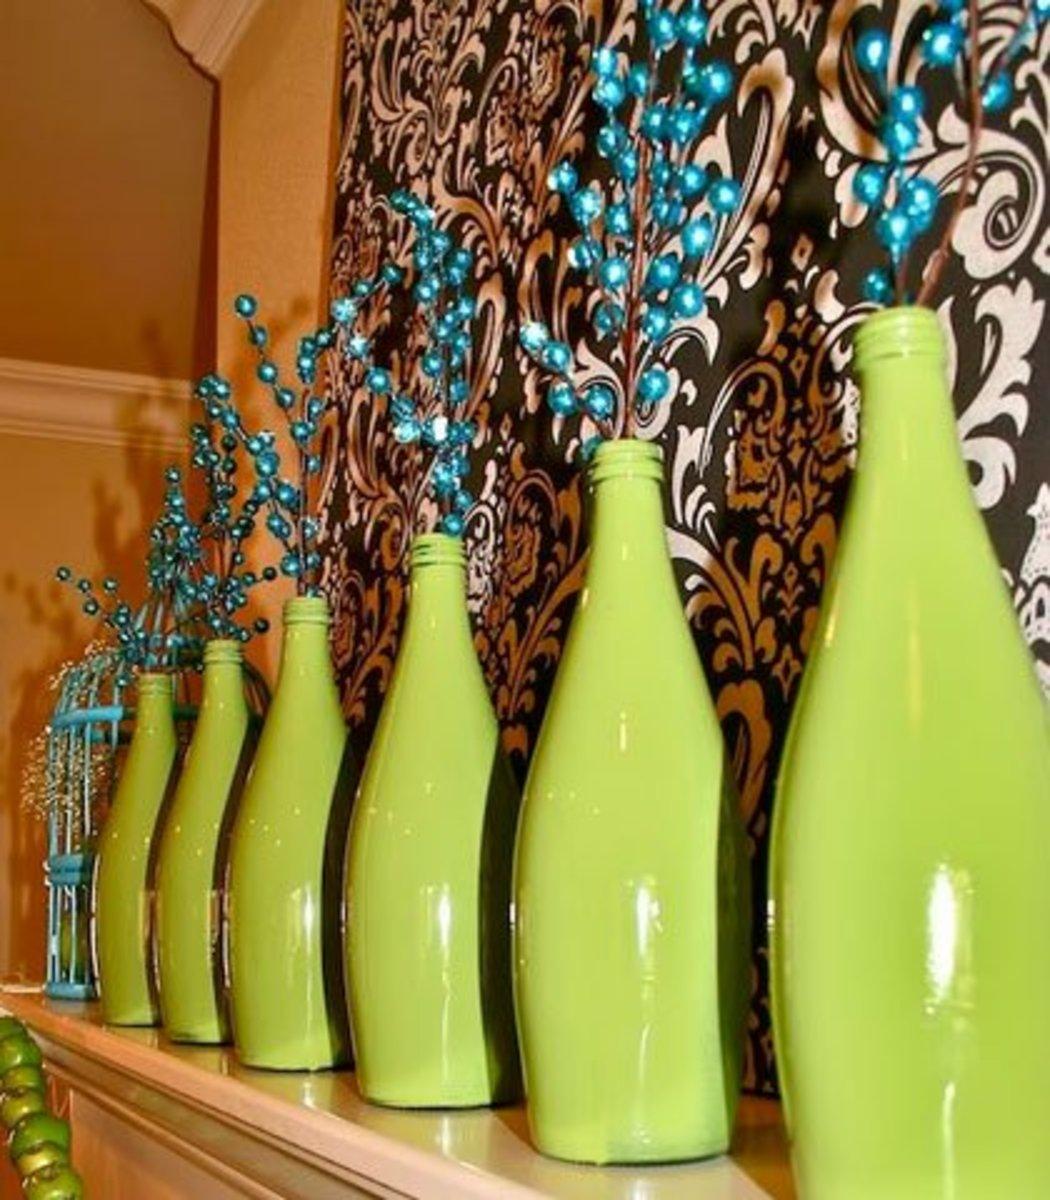 DIY Vase Décor Ideas | Easy and Creative Decor Ideas | Click for Tutorial